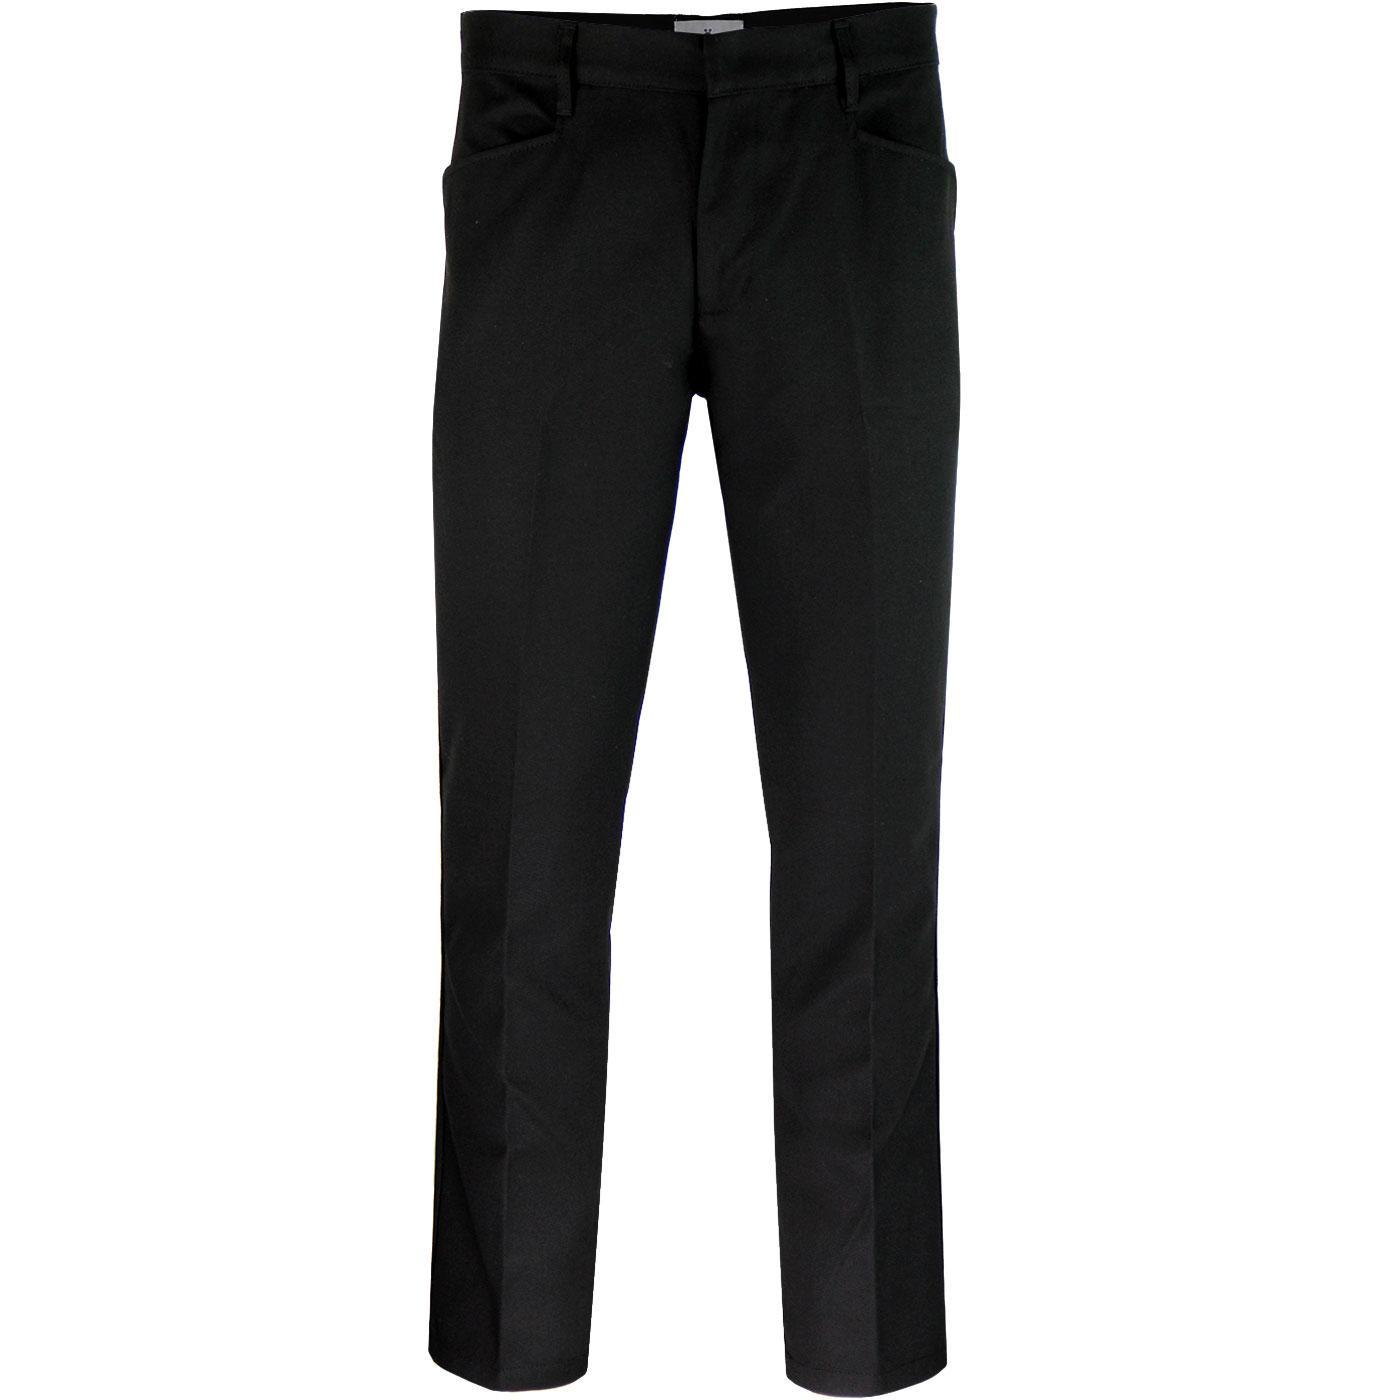 Logan Slim MADCAP ENGLAND 60s Mod Hopsack Trousers